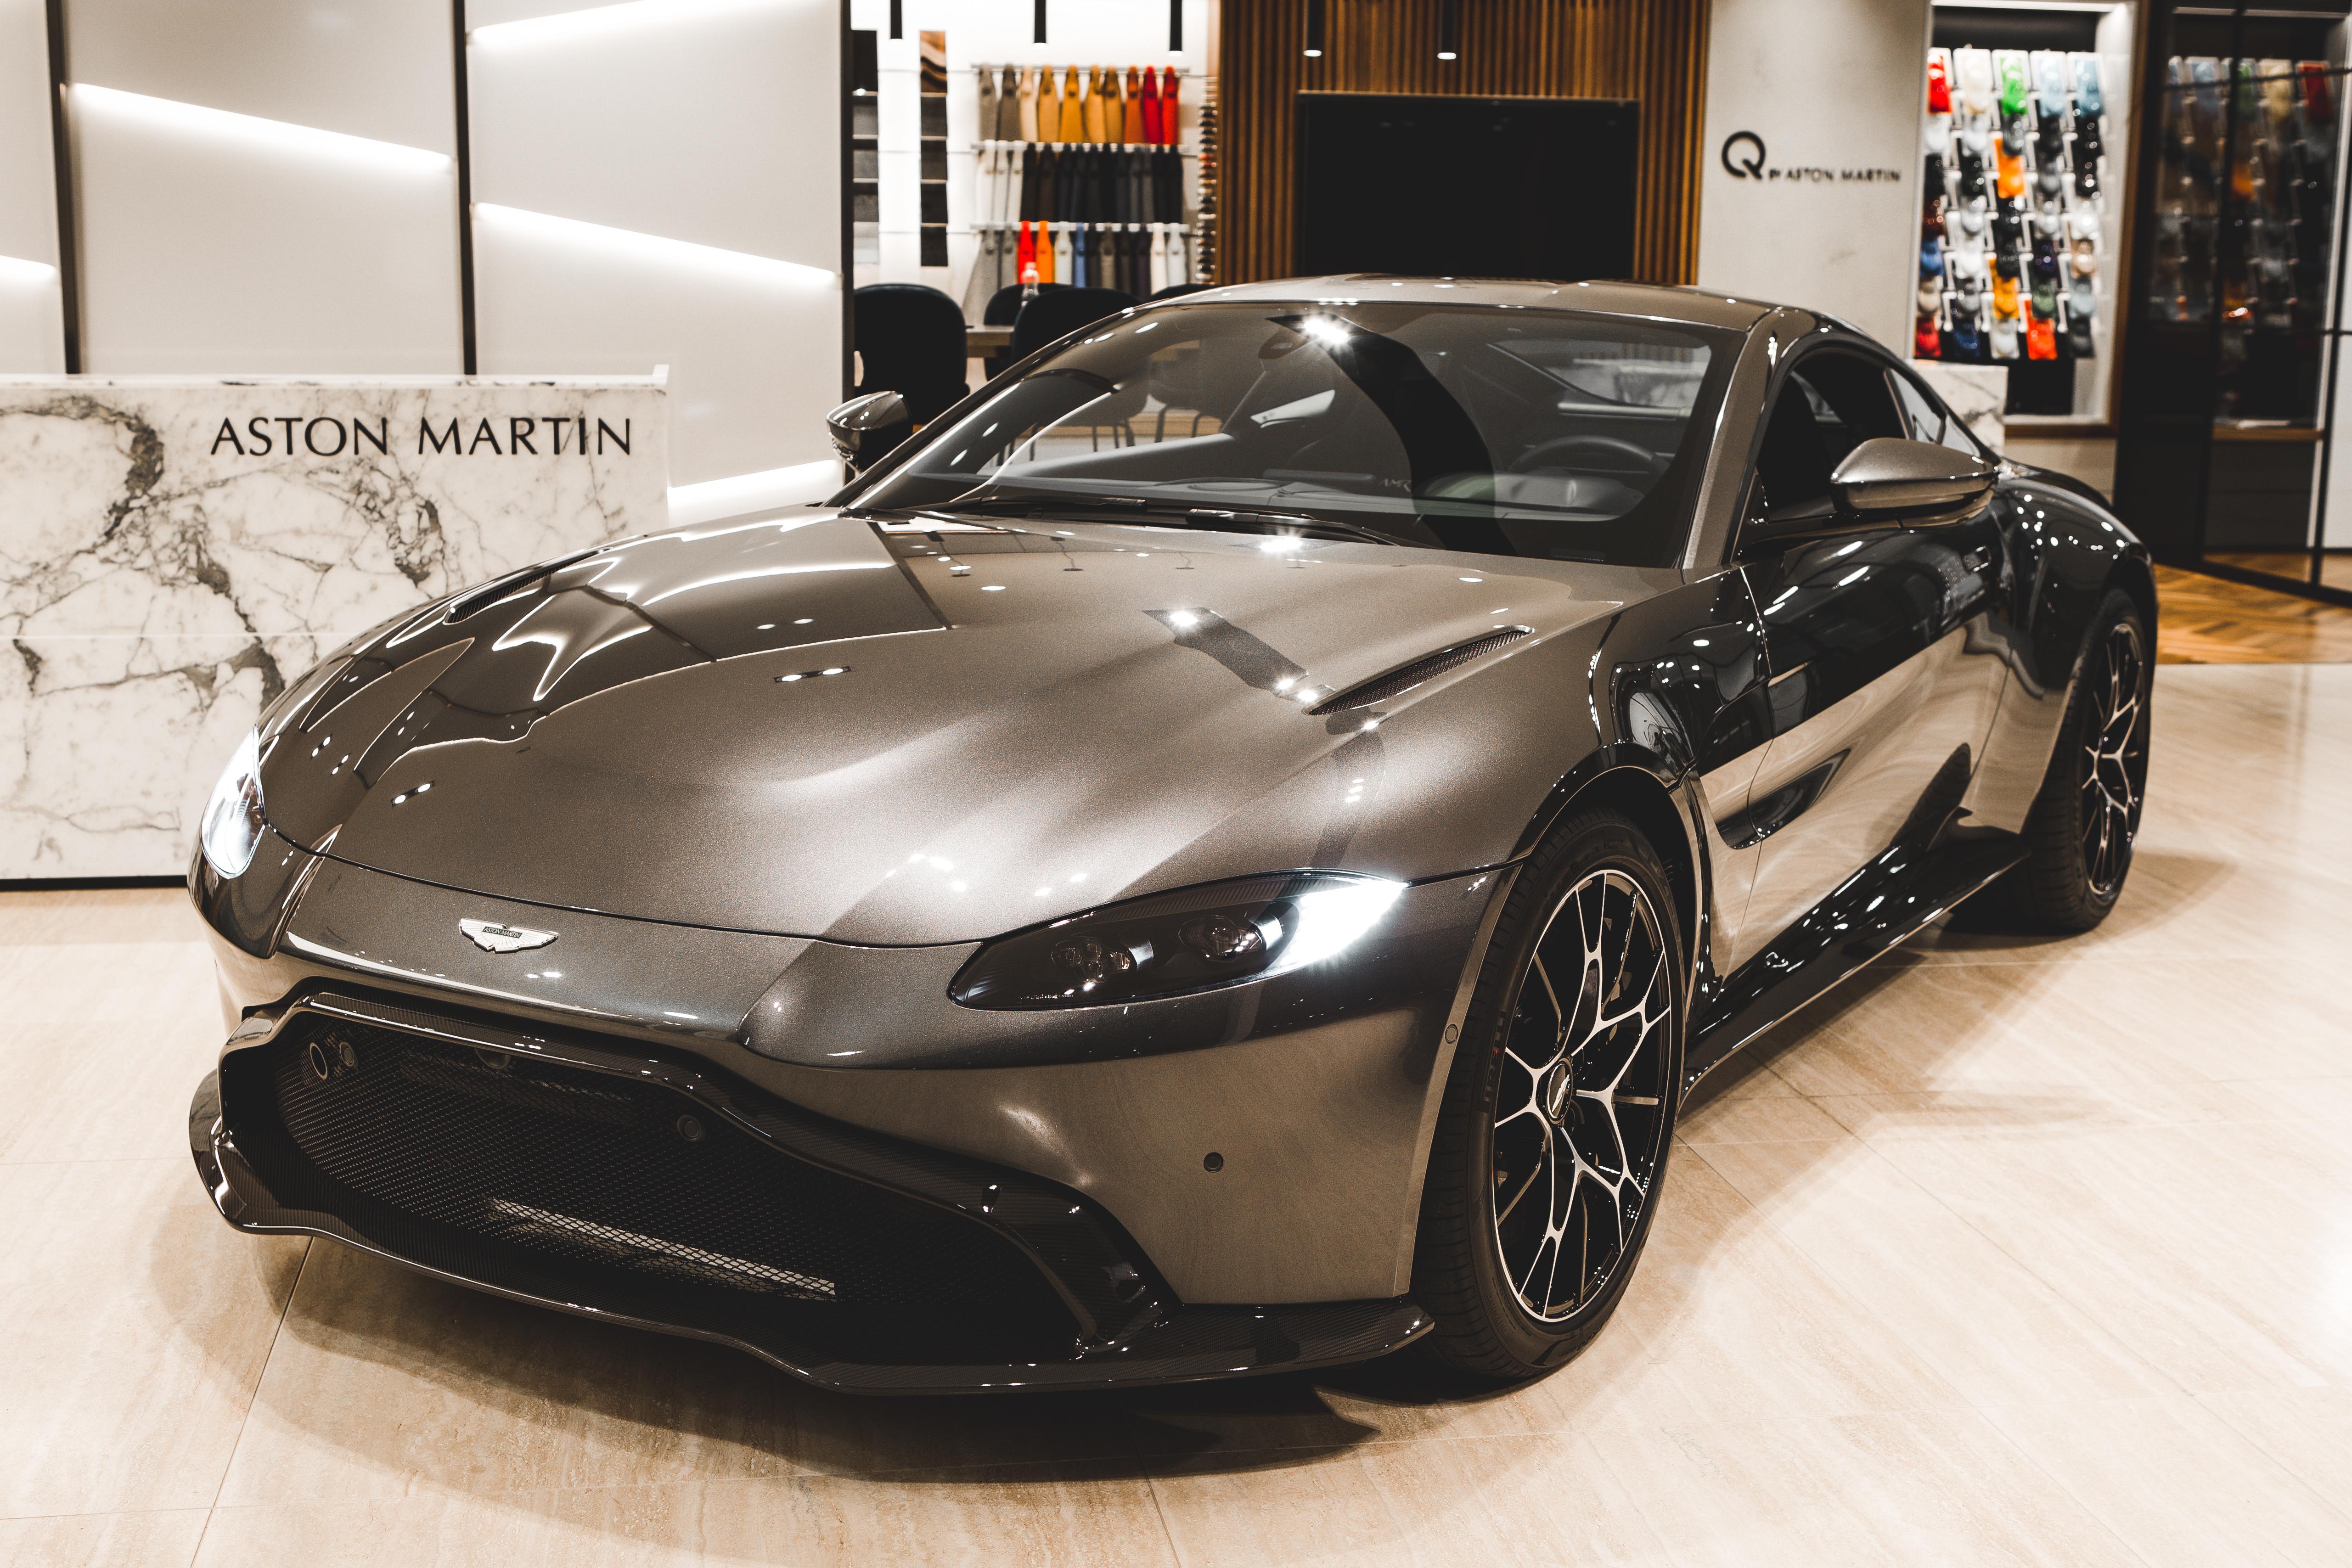 Aston Martin Vantage 4.0 V8 AMR 1 of 200 Limited Edition